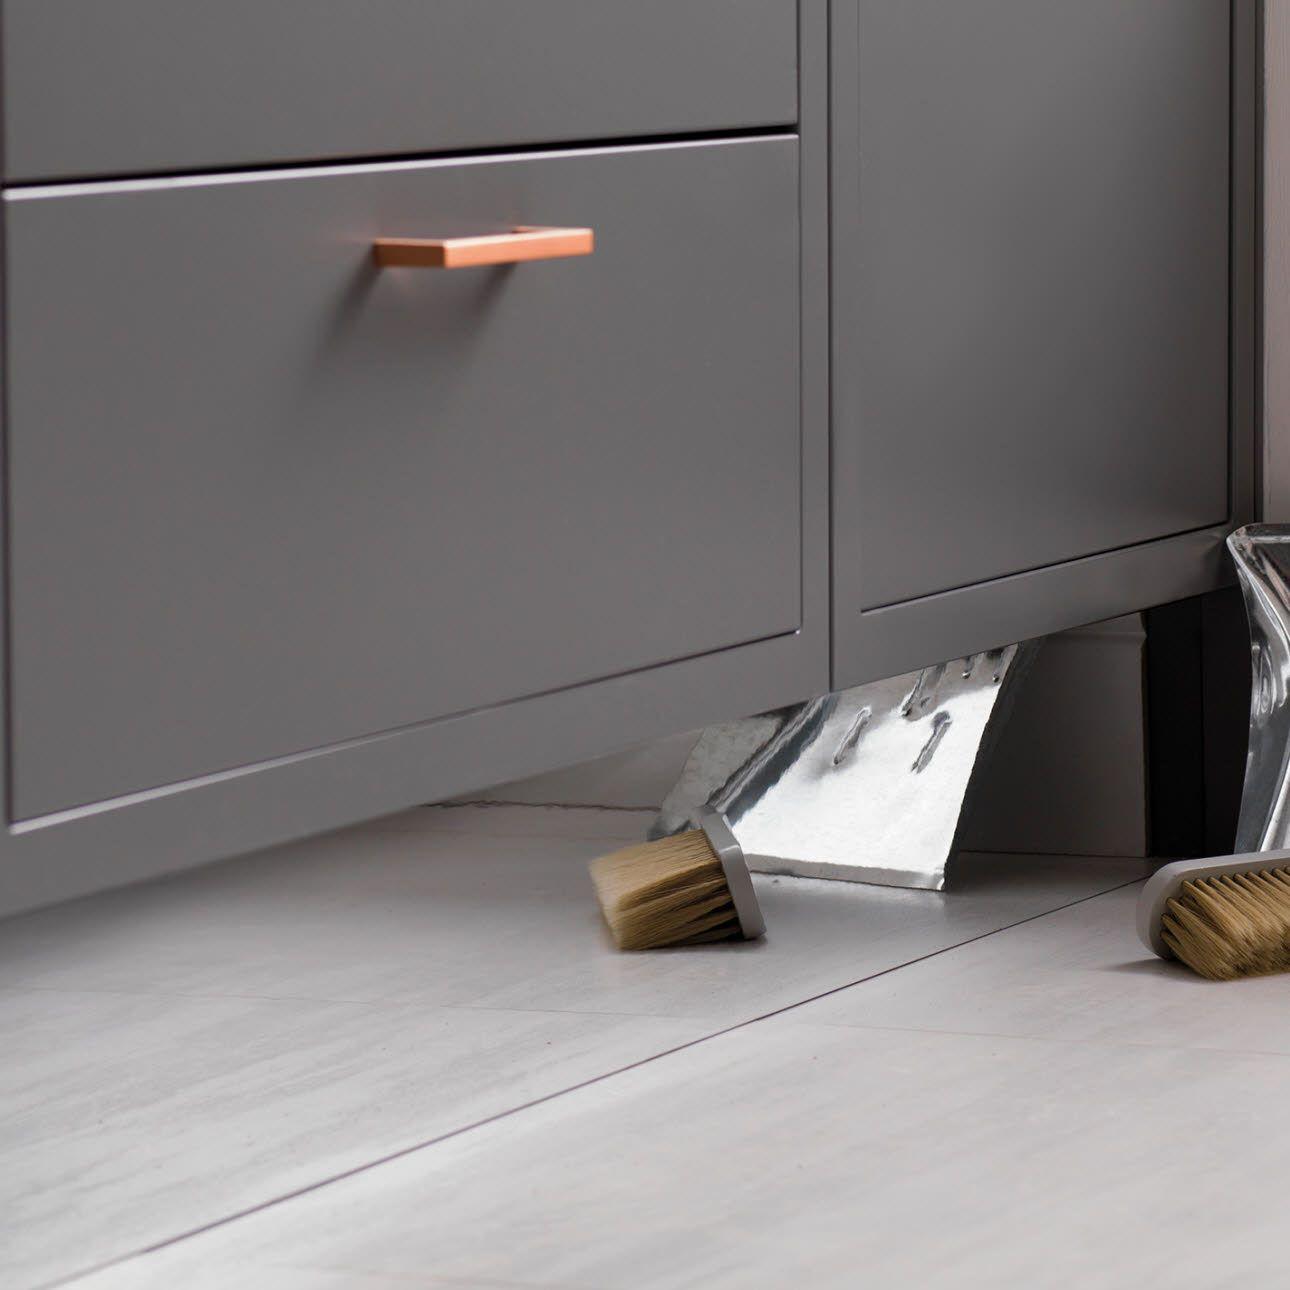 Kitchen drawer accessories uk - Mirrored Plinth Http Www Magnettrade Co Uk Kitchens